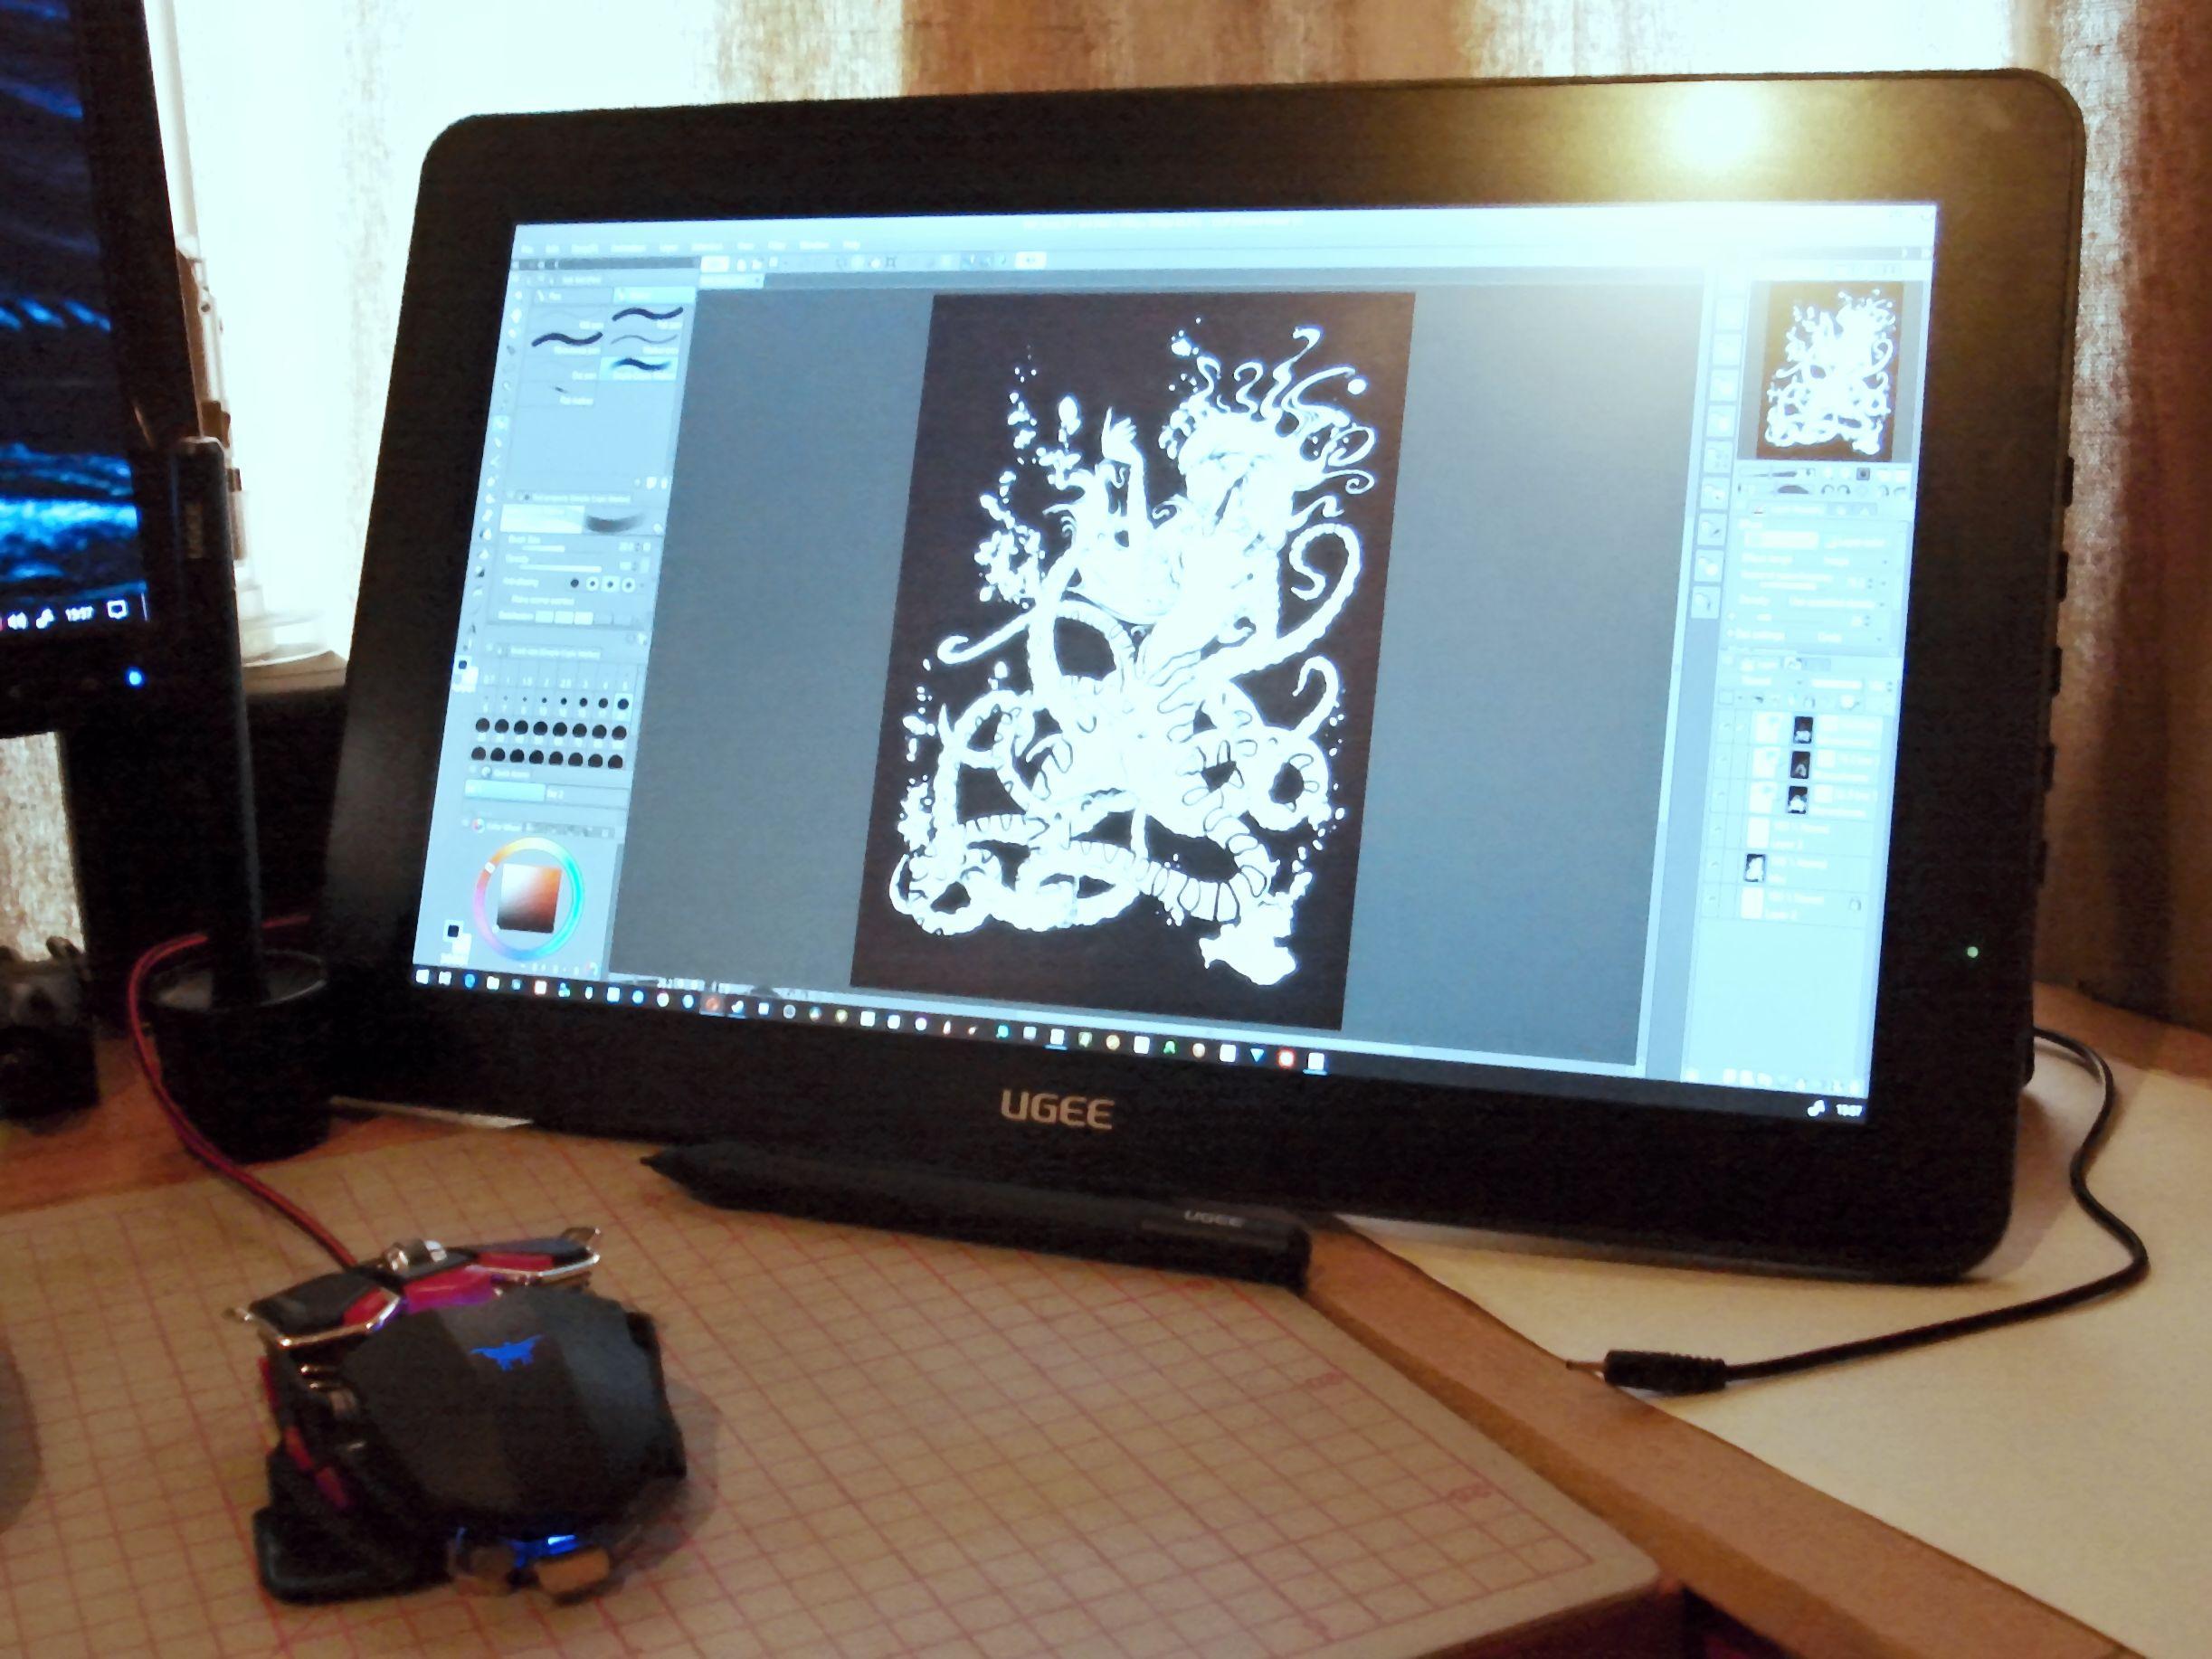 CG Art Nexus - Ugee HK1560 display tablet review